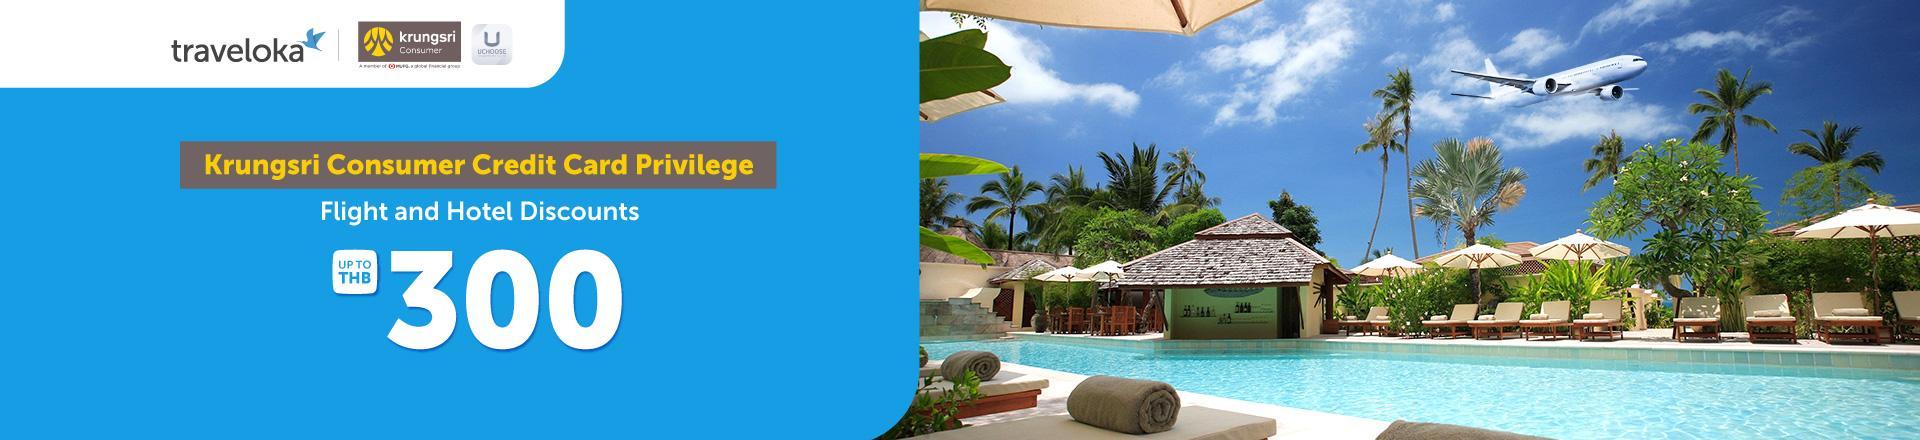 More Benefits On Traveloka App